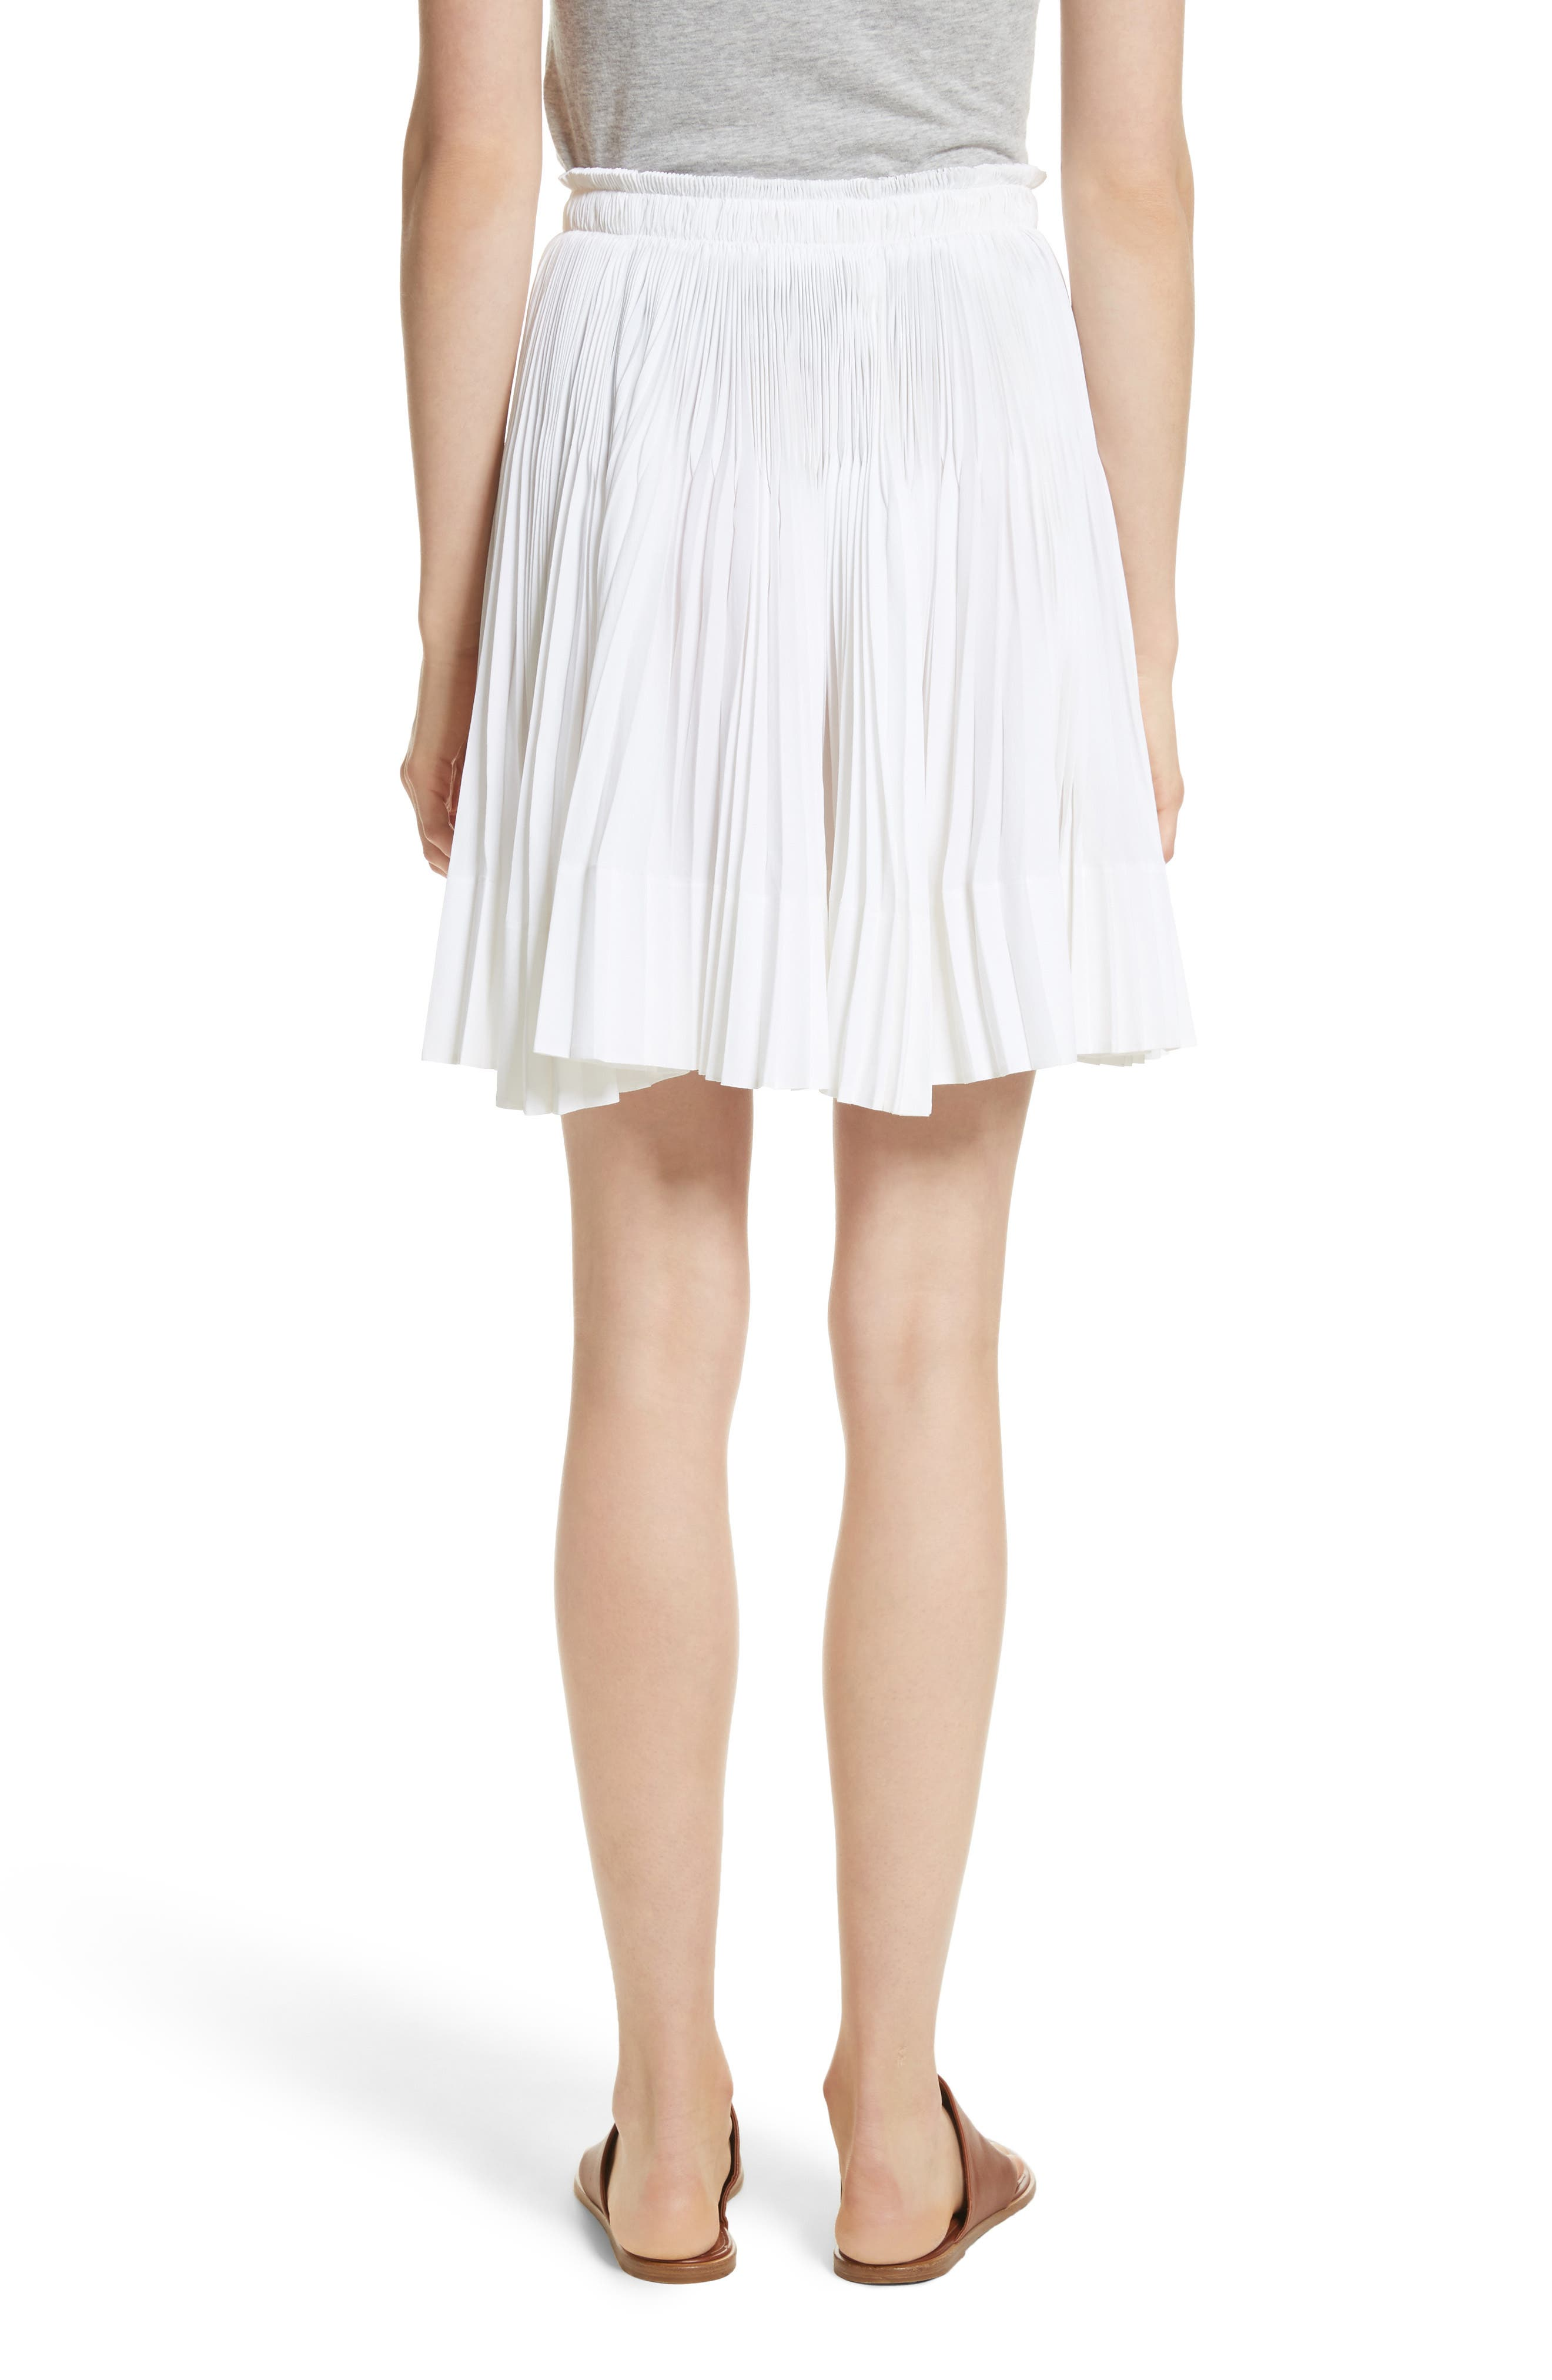 VINCE,                             Multi Pleat Skirt,                             Alternate thumbnail 2, color,                             137